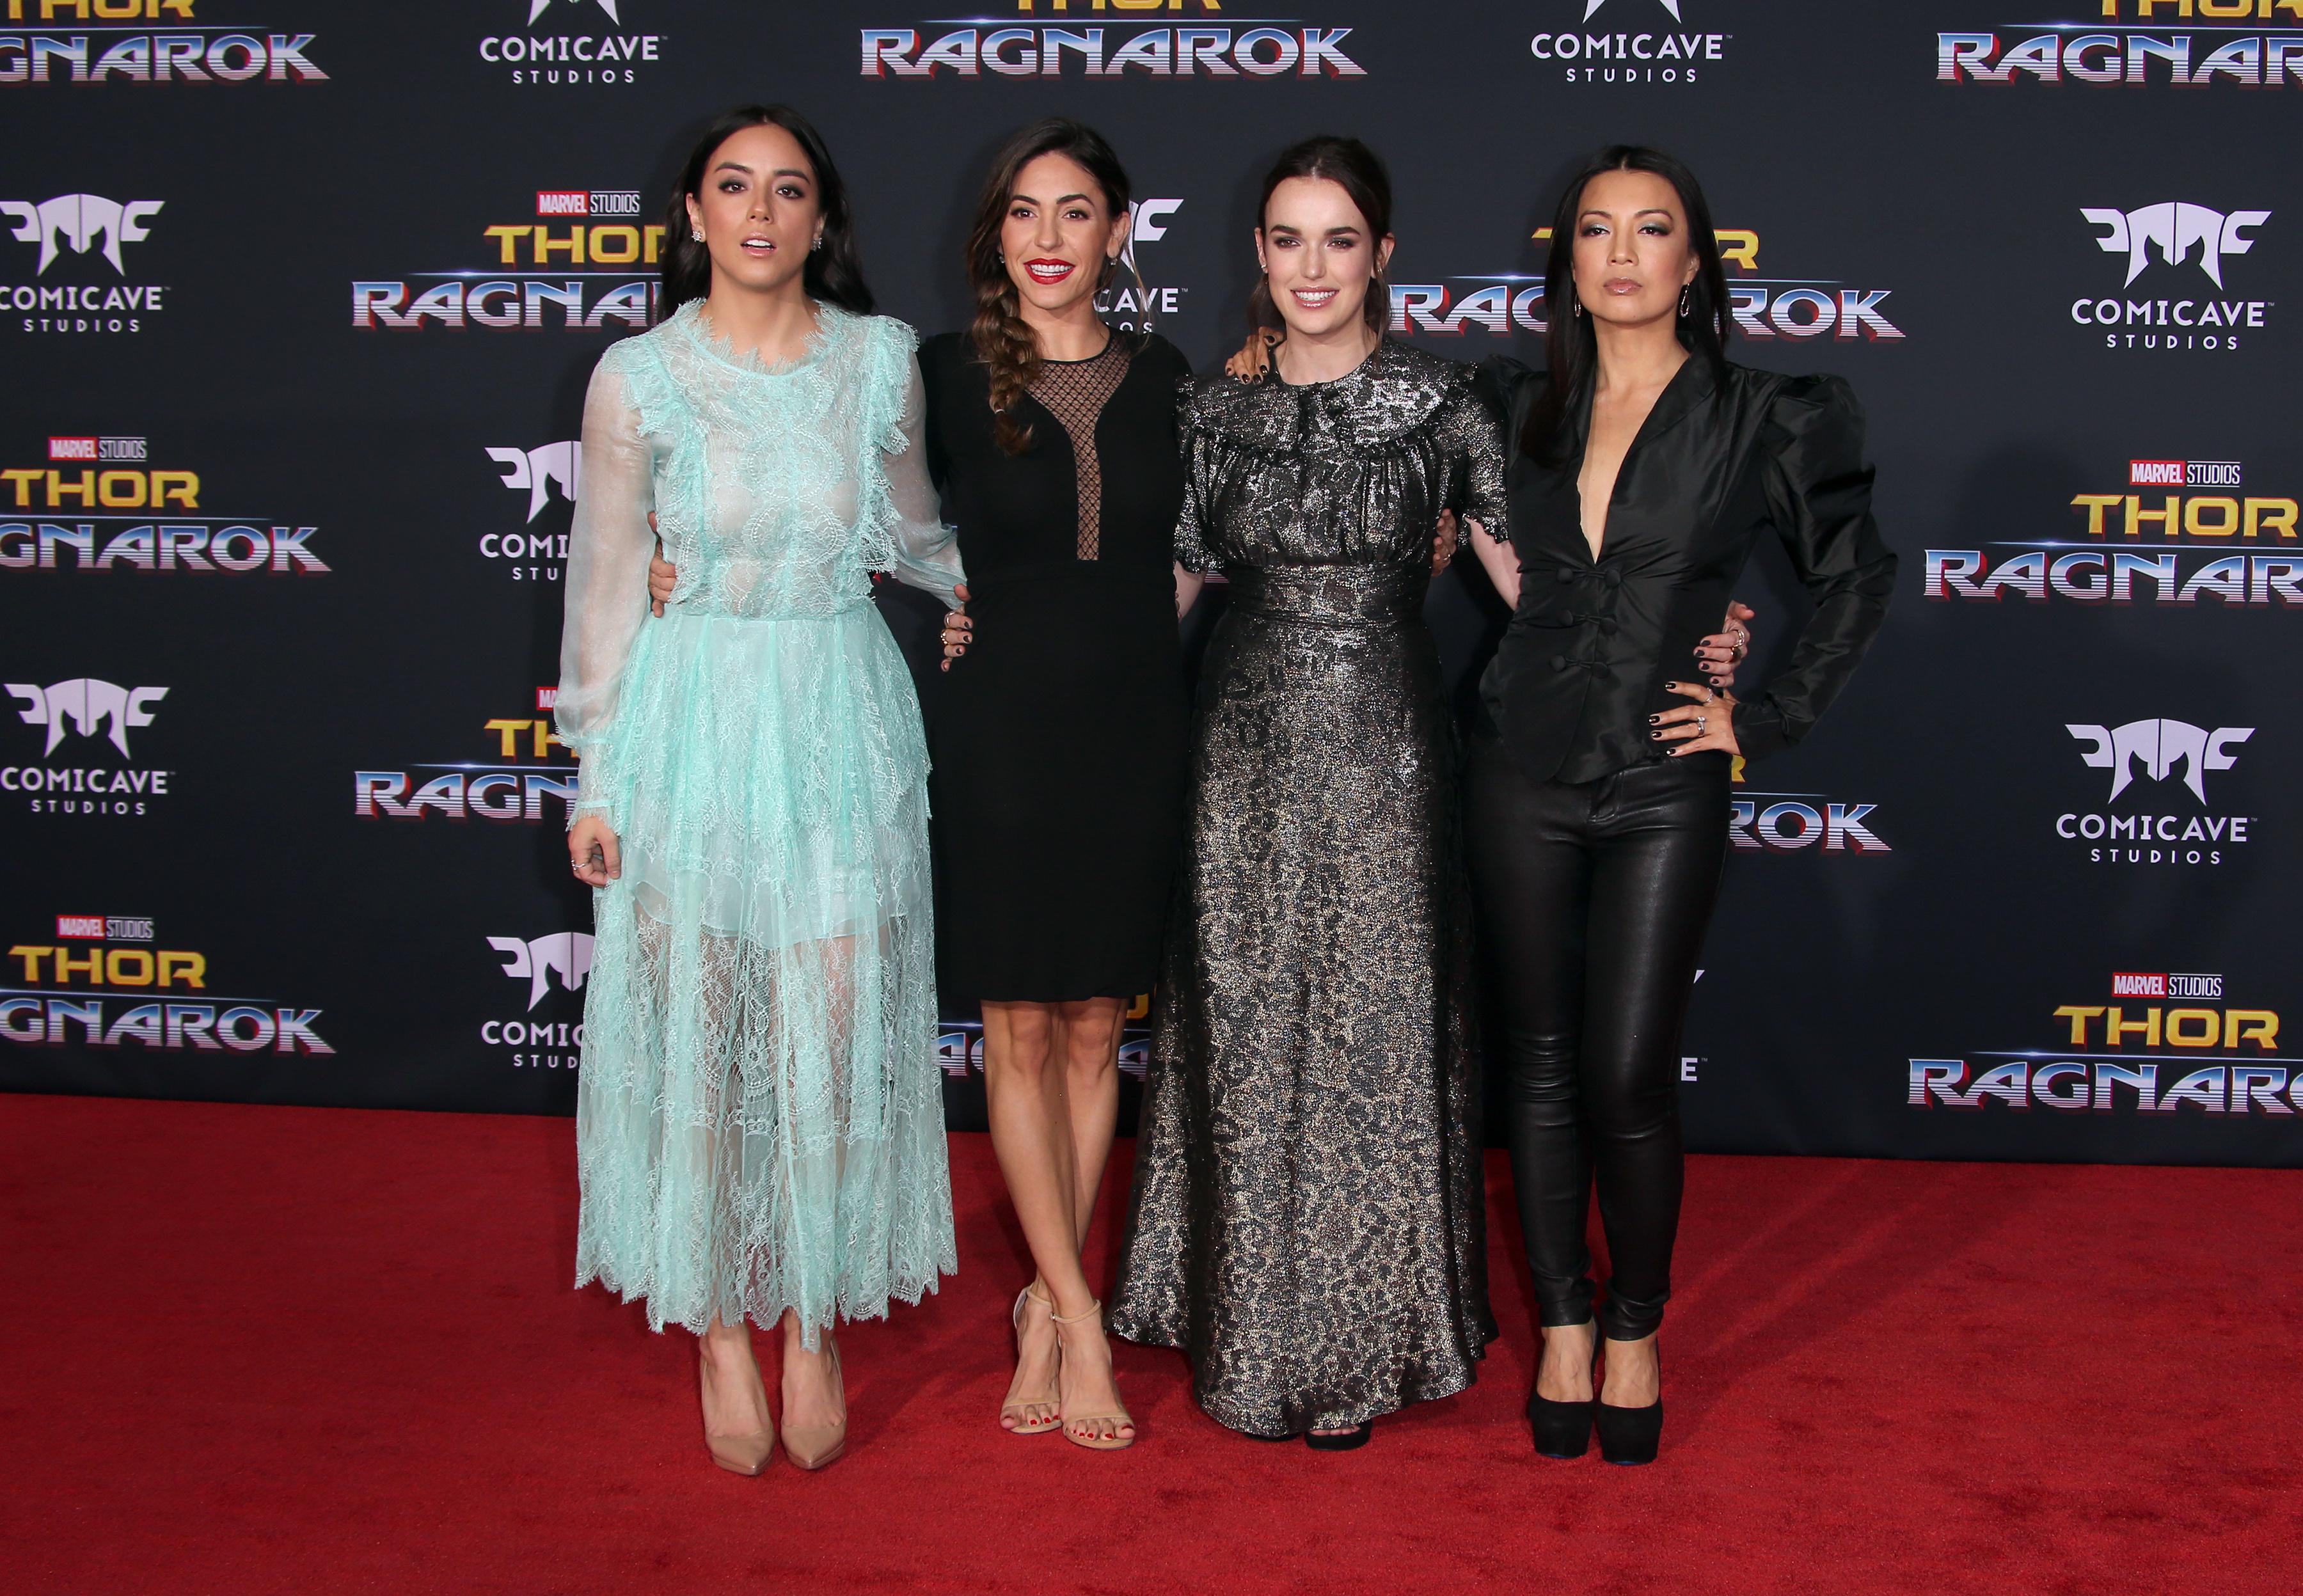 Chloe Bennet, Natalia Cordova-Buckley, Elizabeth Henstridge és Ming-Na Wen